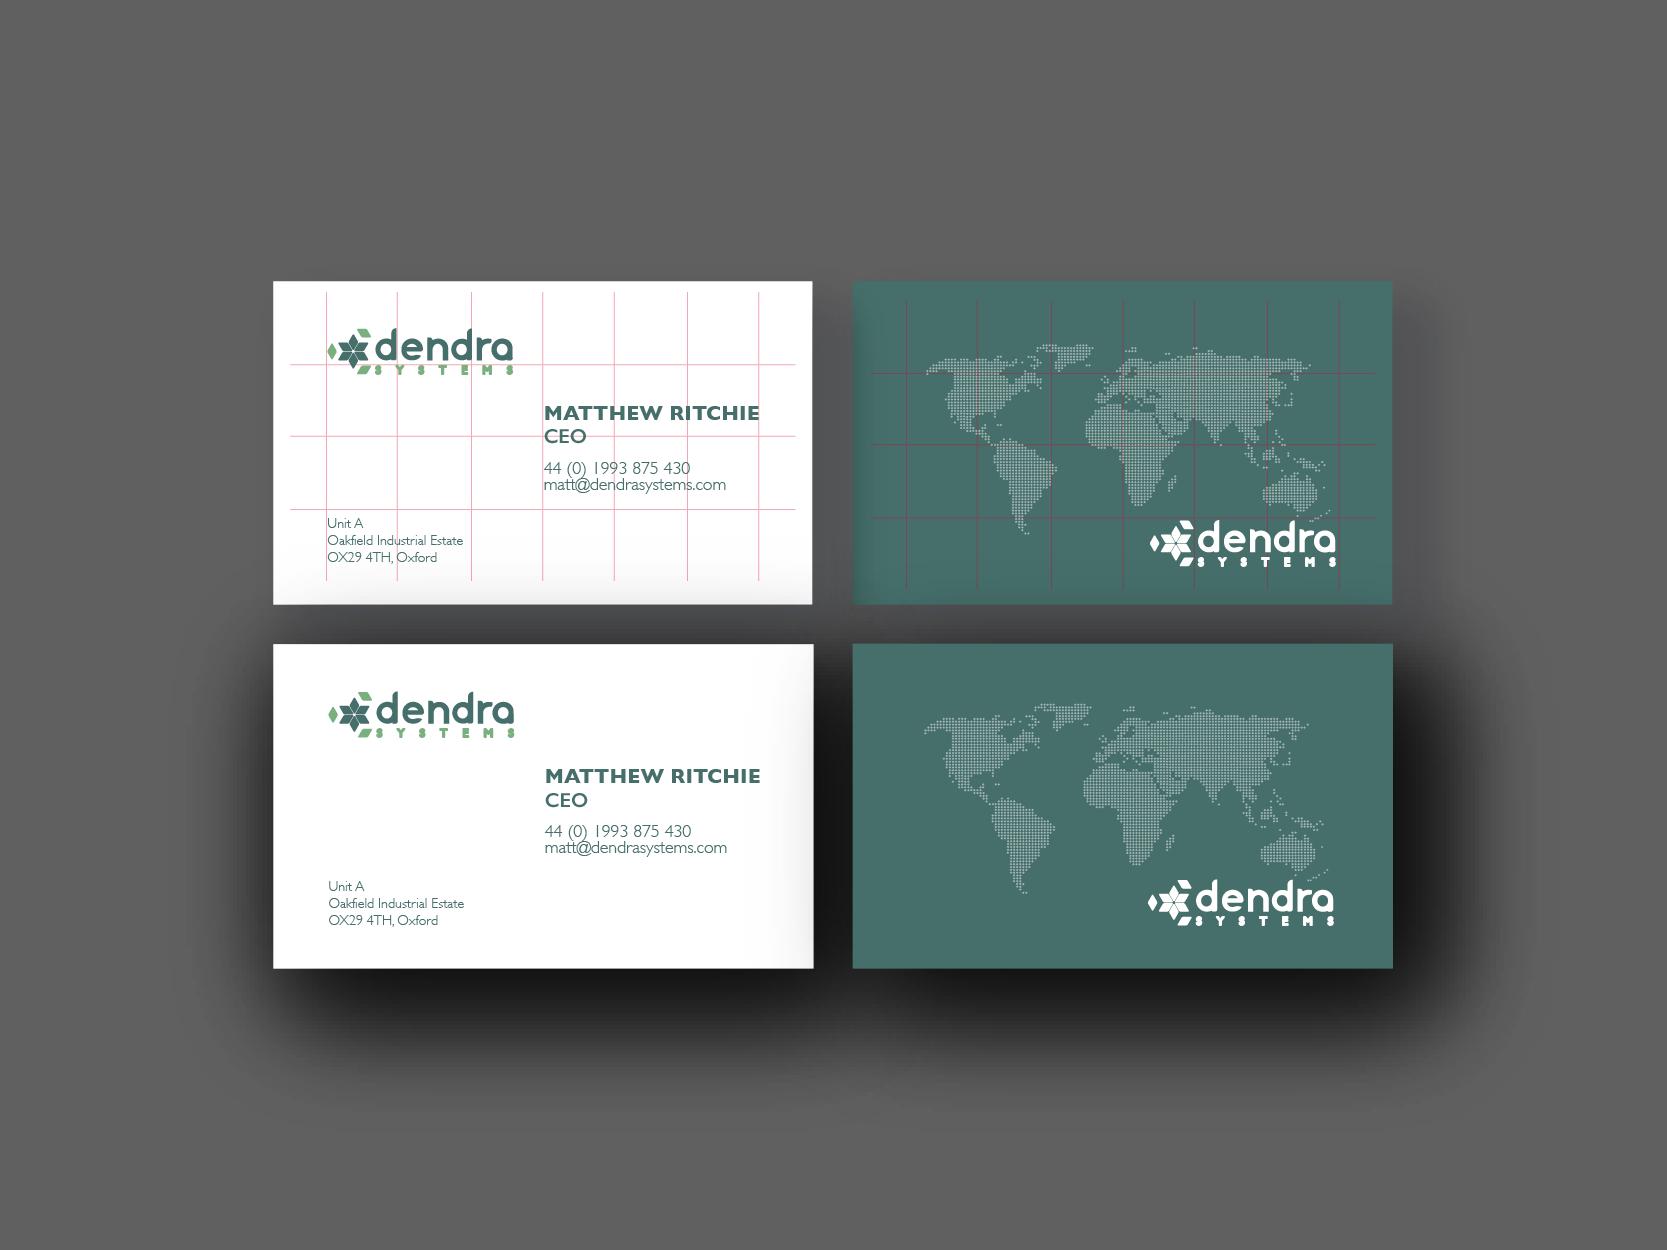 brand design on business cards